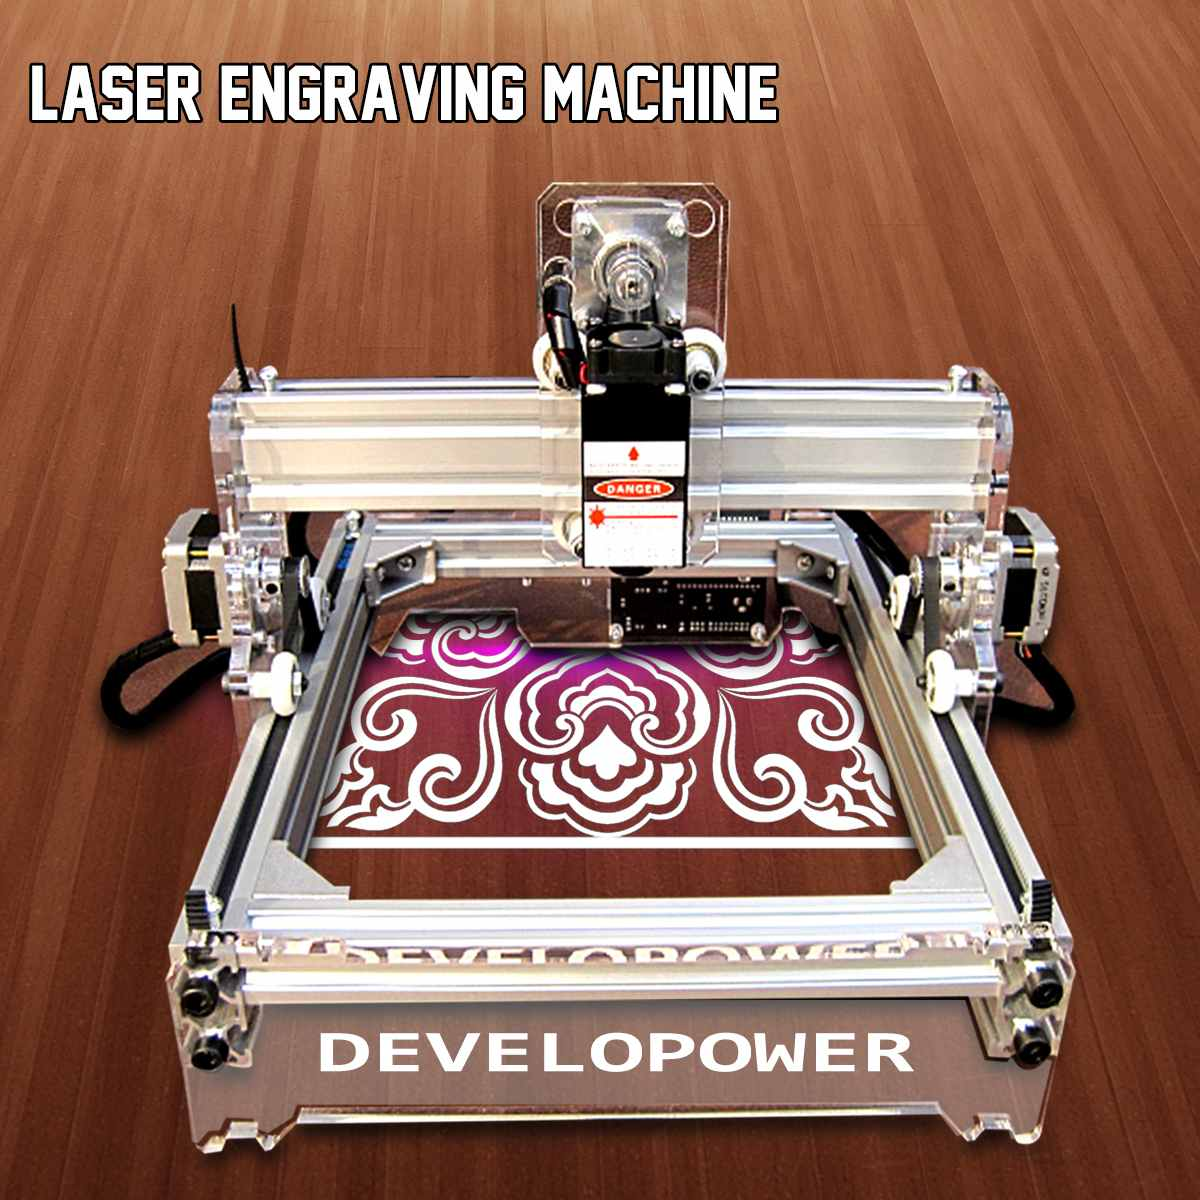 17x20cm 2000mW Desktop Engraving Printer DIY Desktop Wood Cutter CNC Wood Router Laser Engraver Cutting Machine